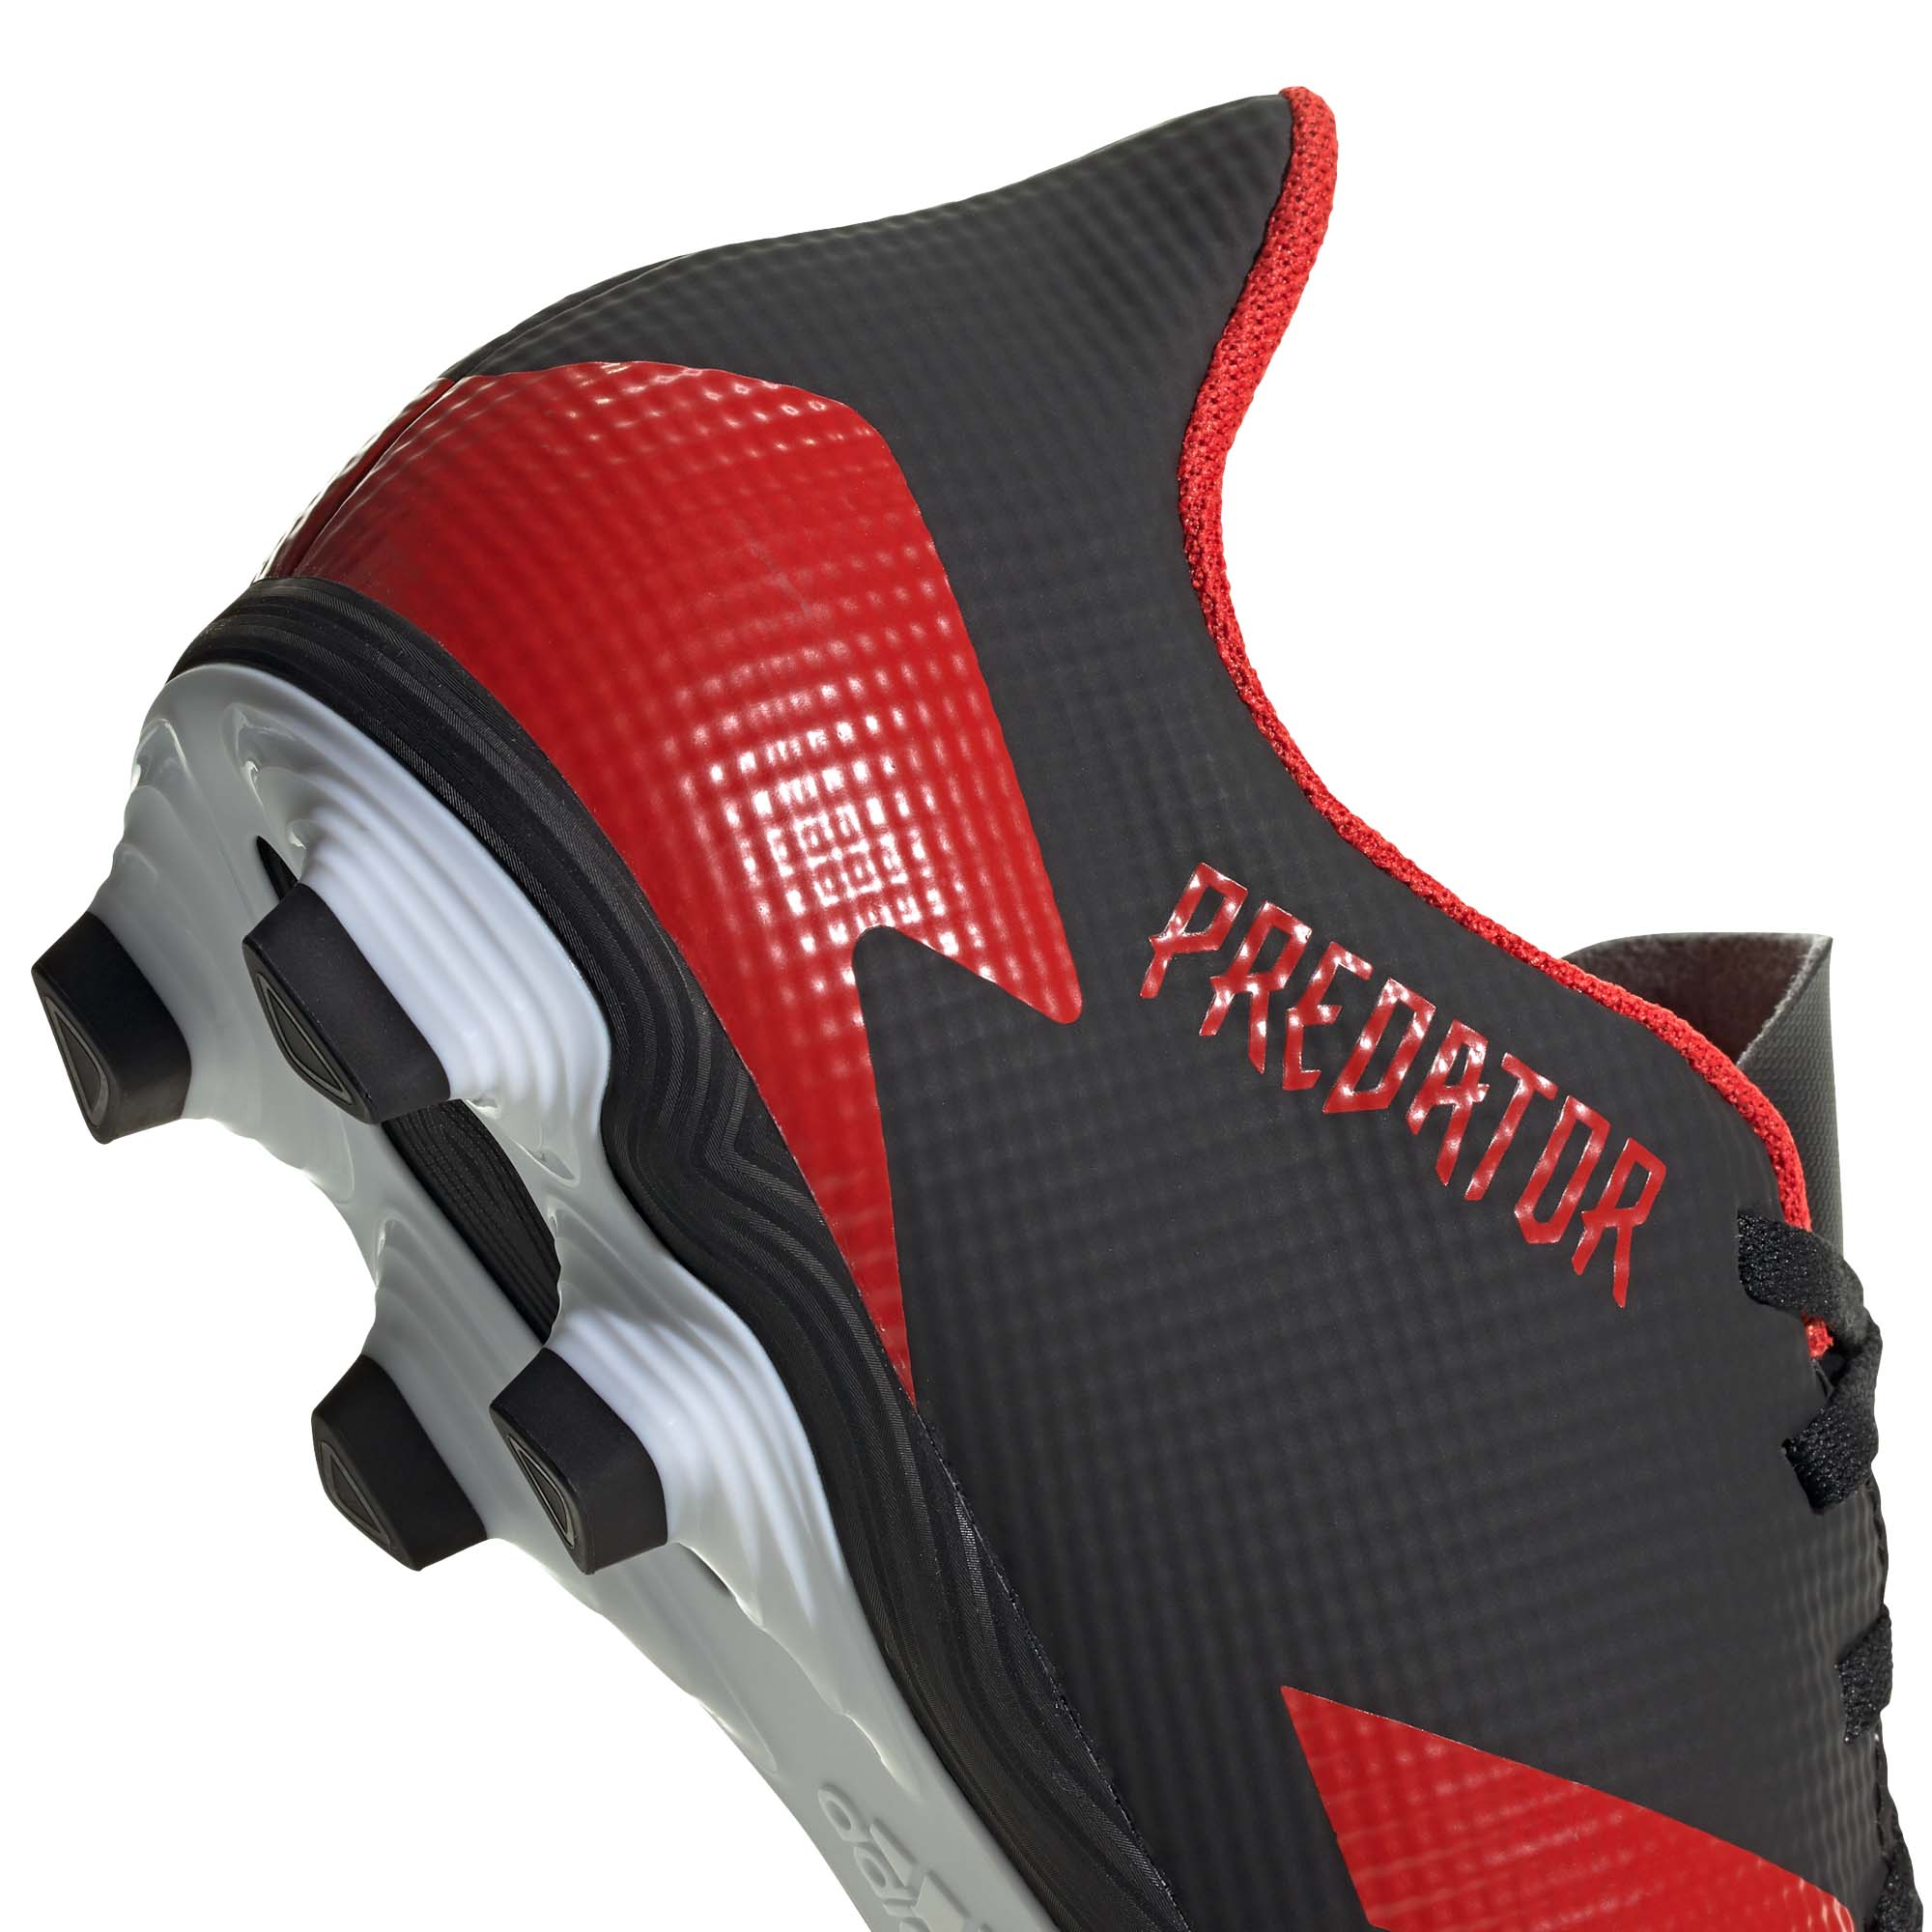 Adidas-Predator-20-4-FXG-Firm-Ground-pour-homme-Football-Boot-Noir-Rouge miniature 10